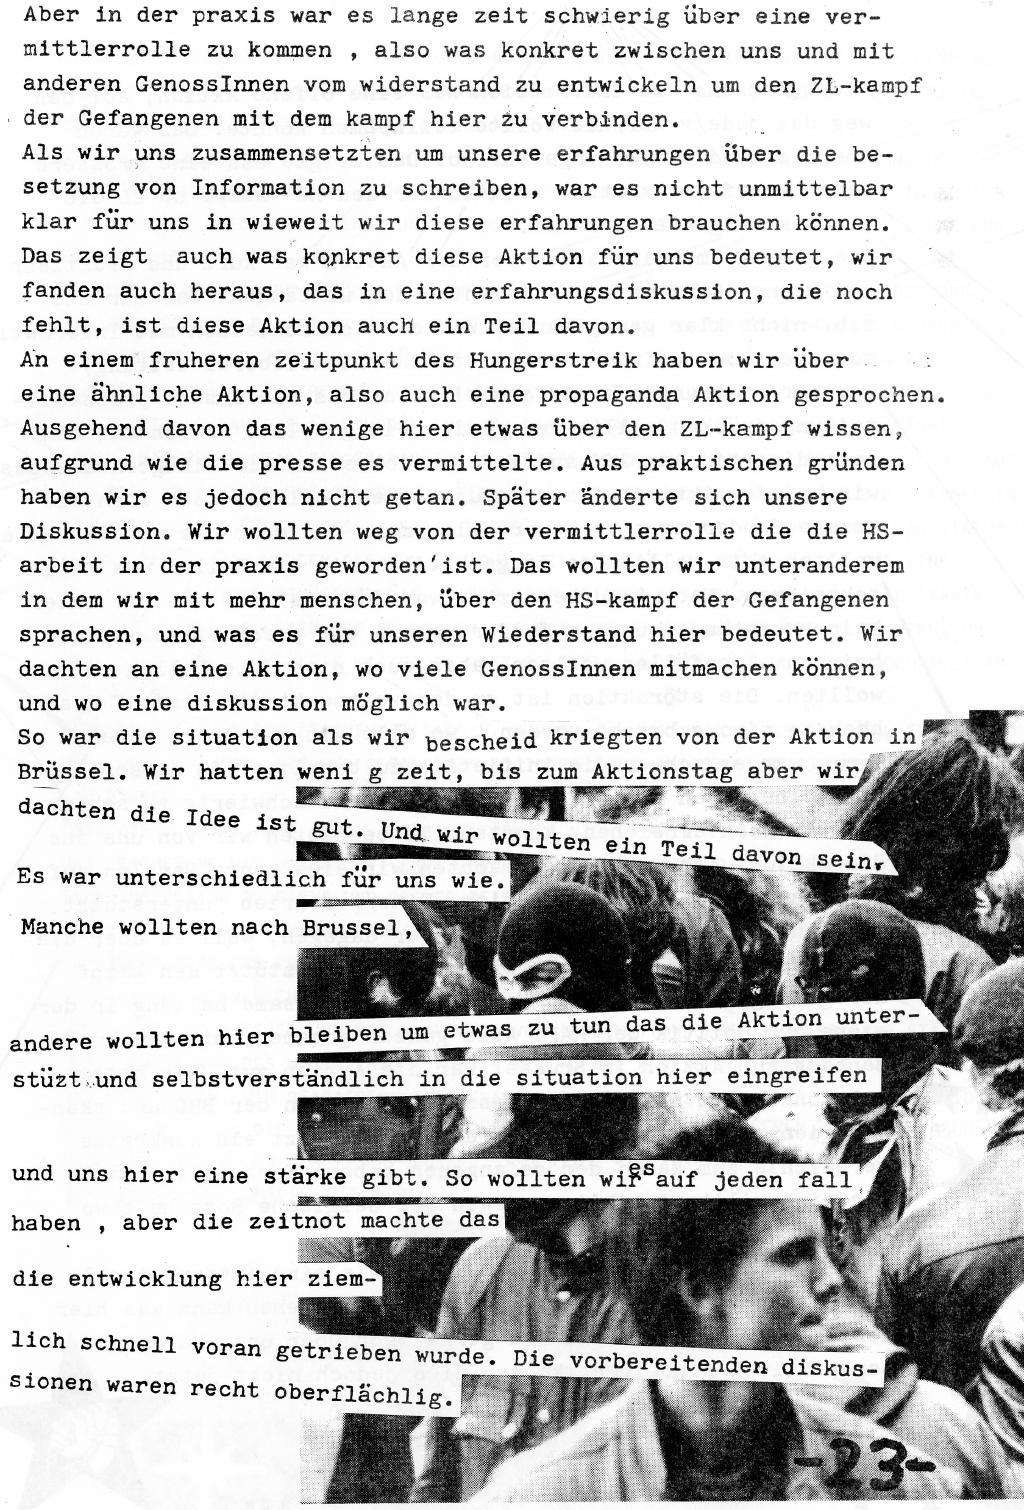 Belgien_Doku_Besetzung_EG_Kommission_1989_025